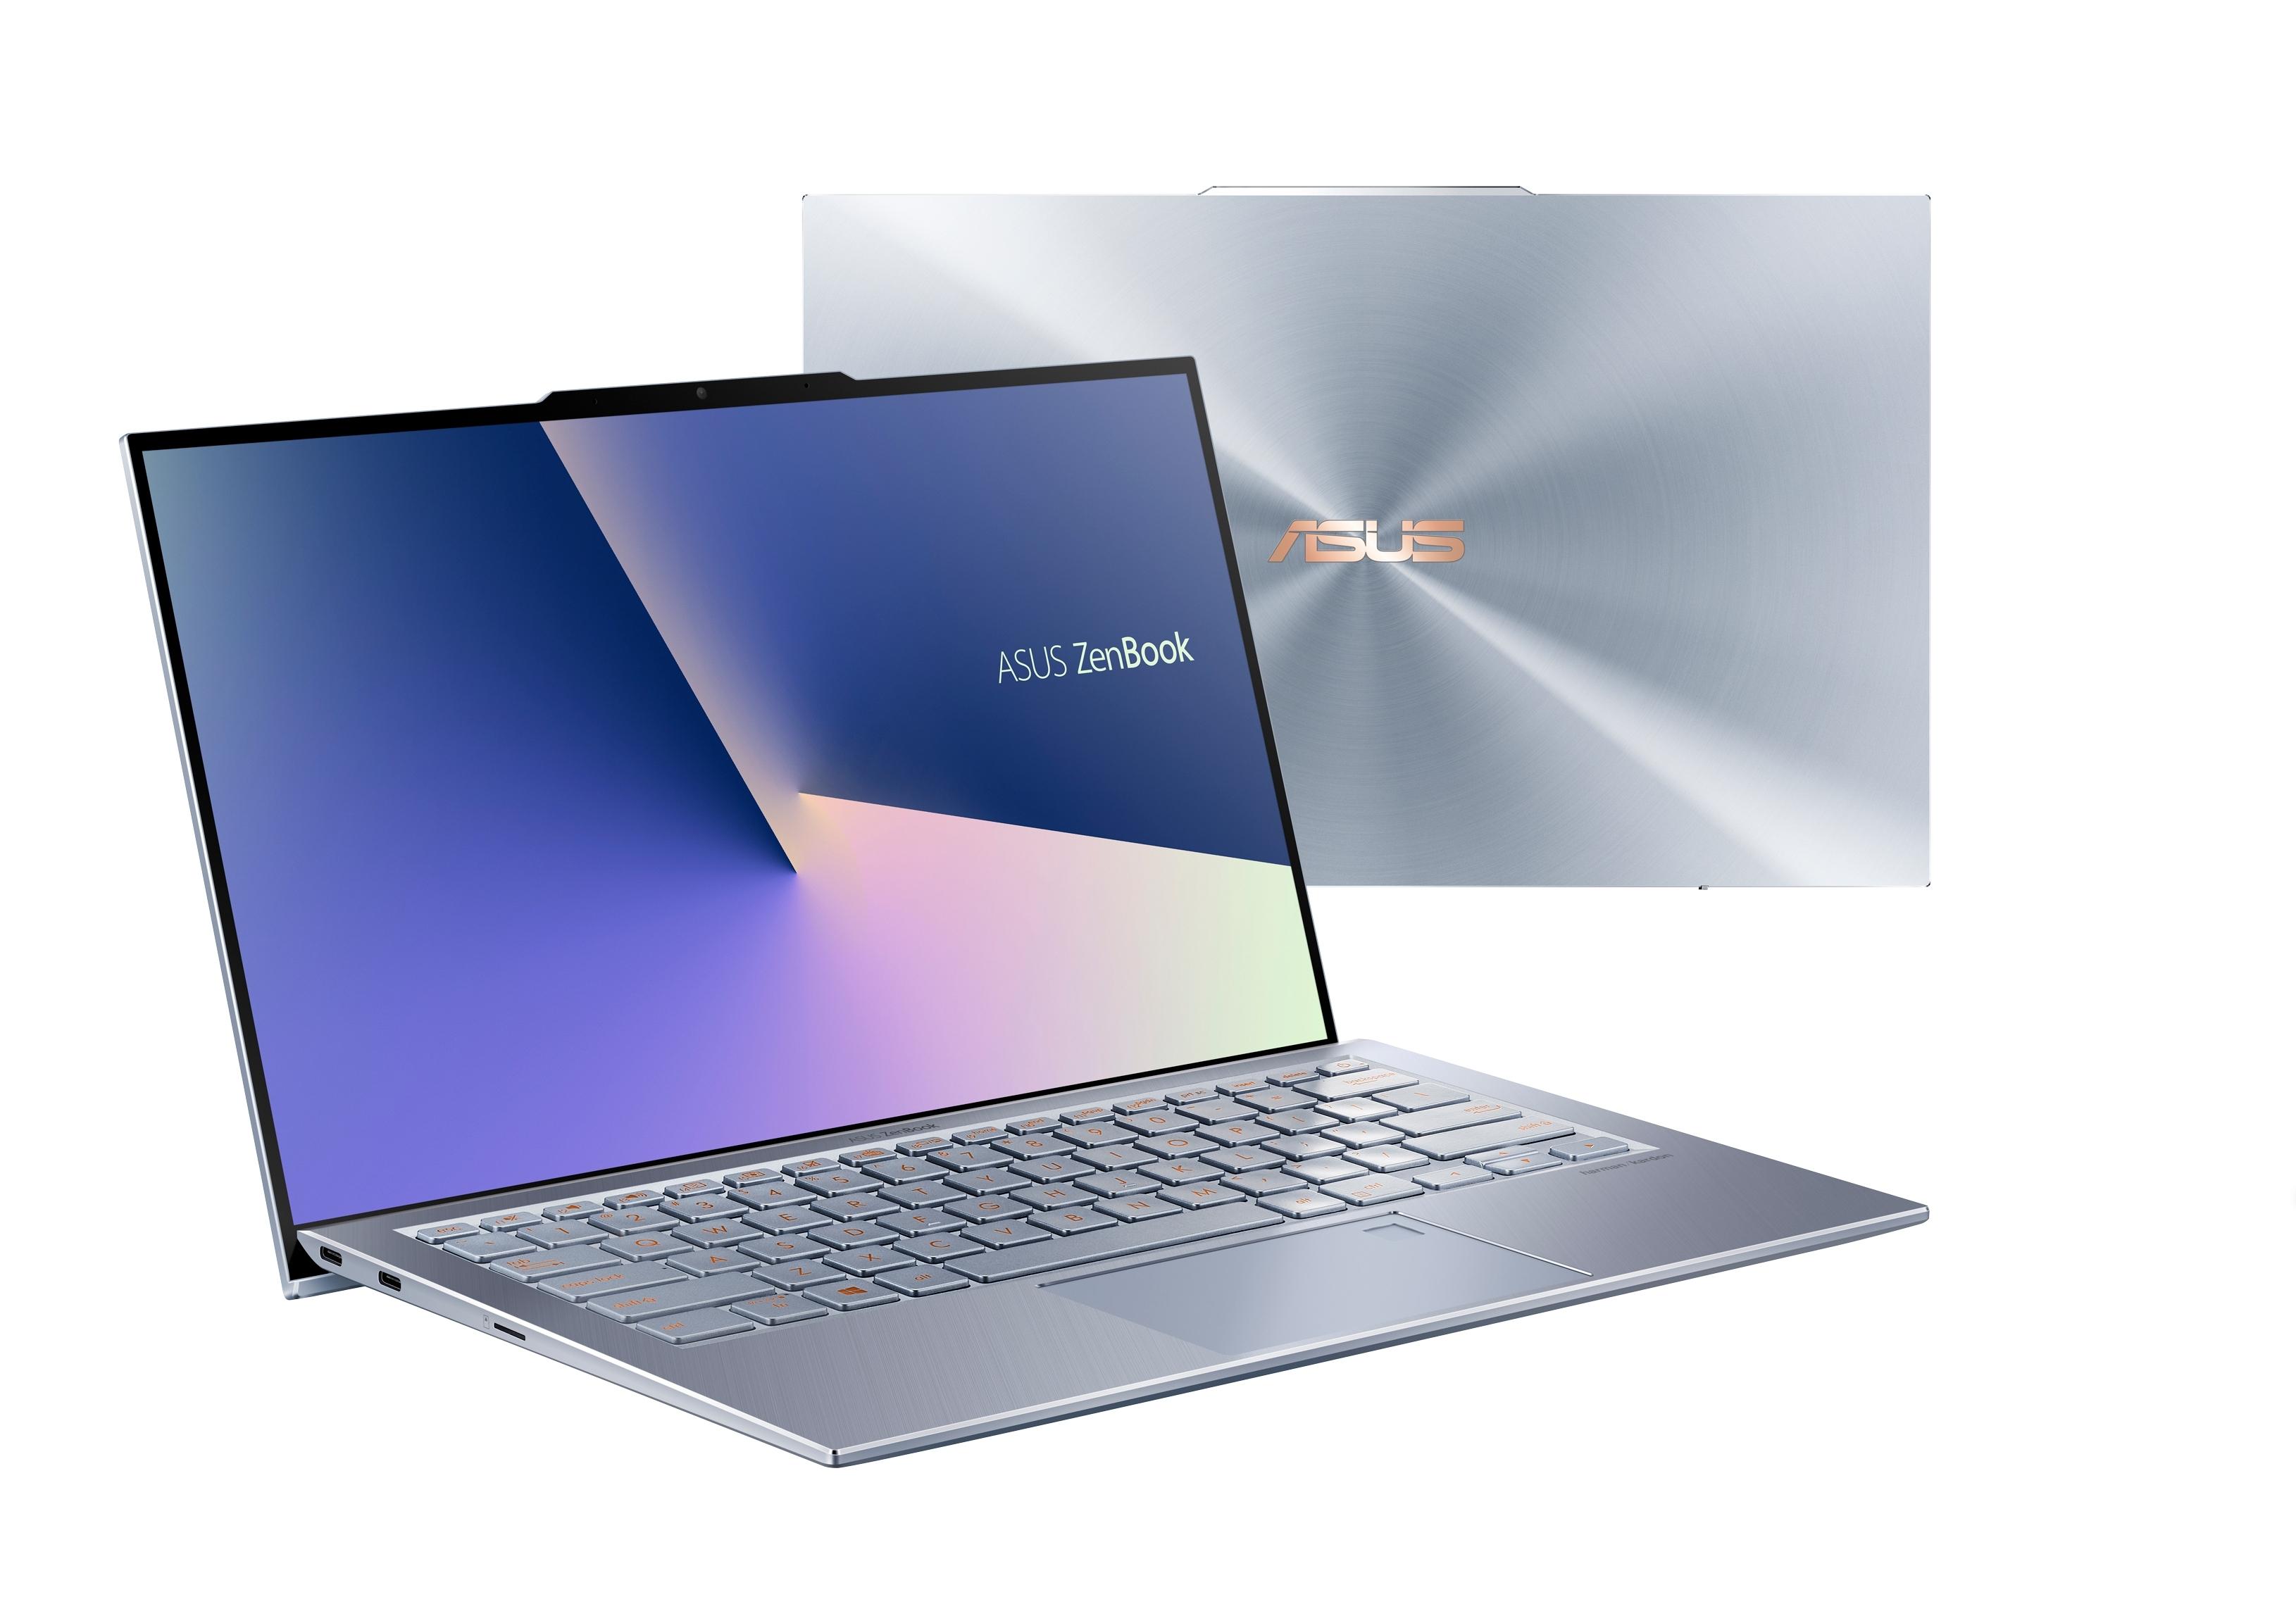 Asus ZenBook S13 laptop